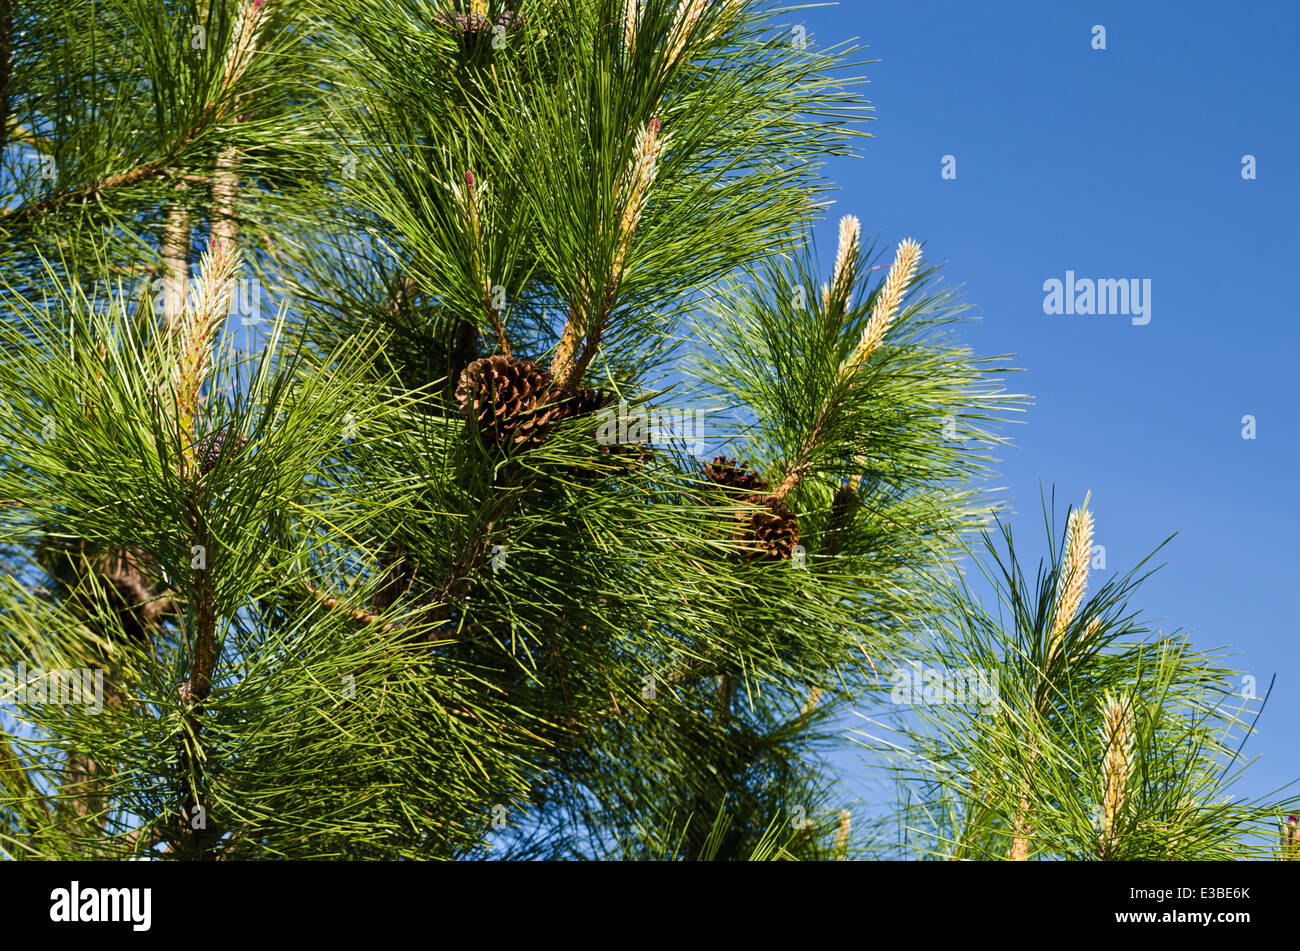 ponderosa pine tree branch images galleries with a bite. Black Bedroom Furniture Sets. Home Design Ideas